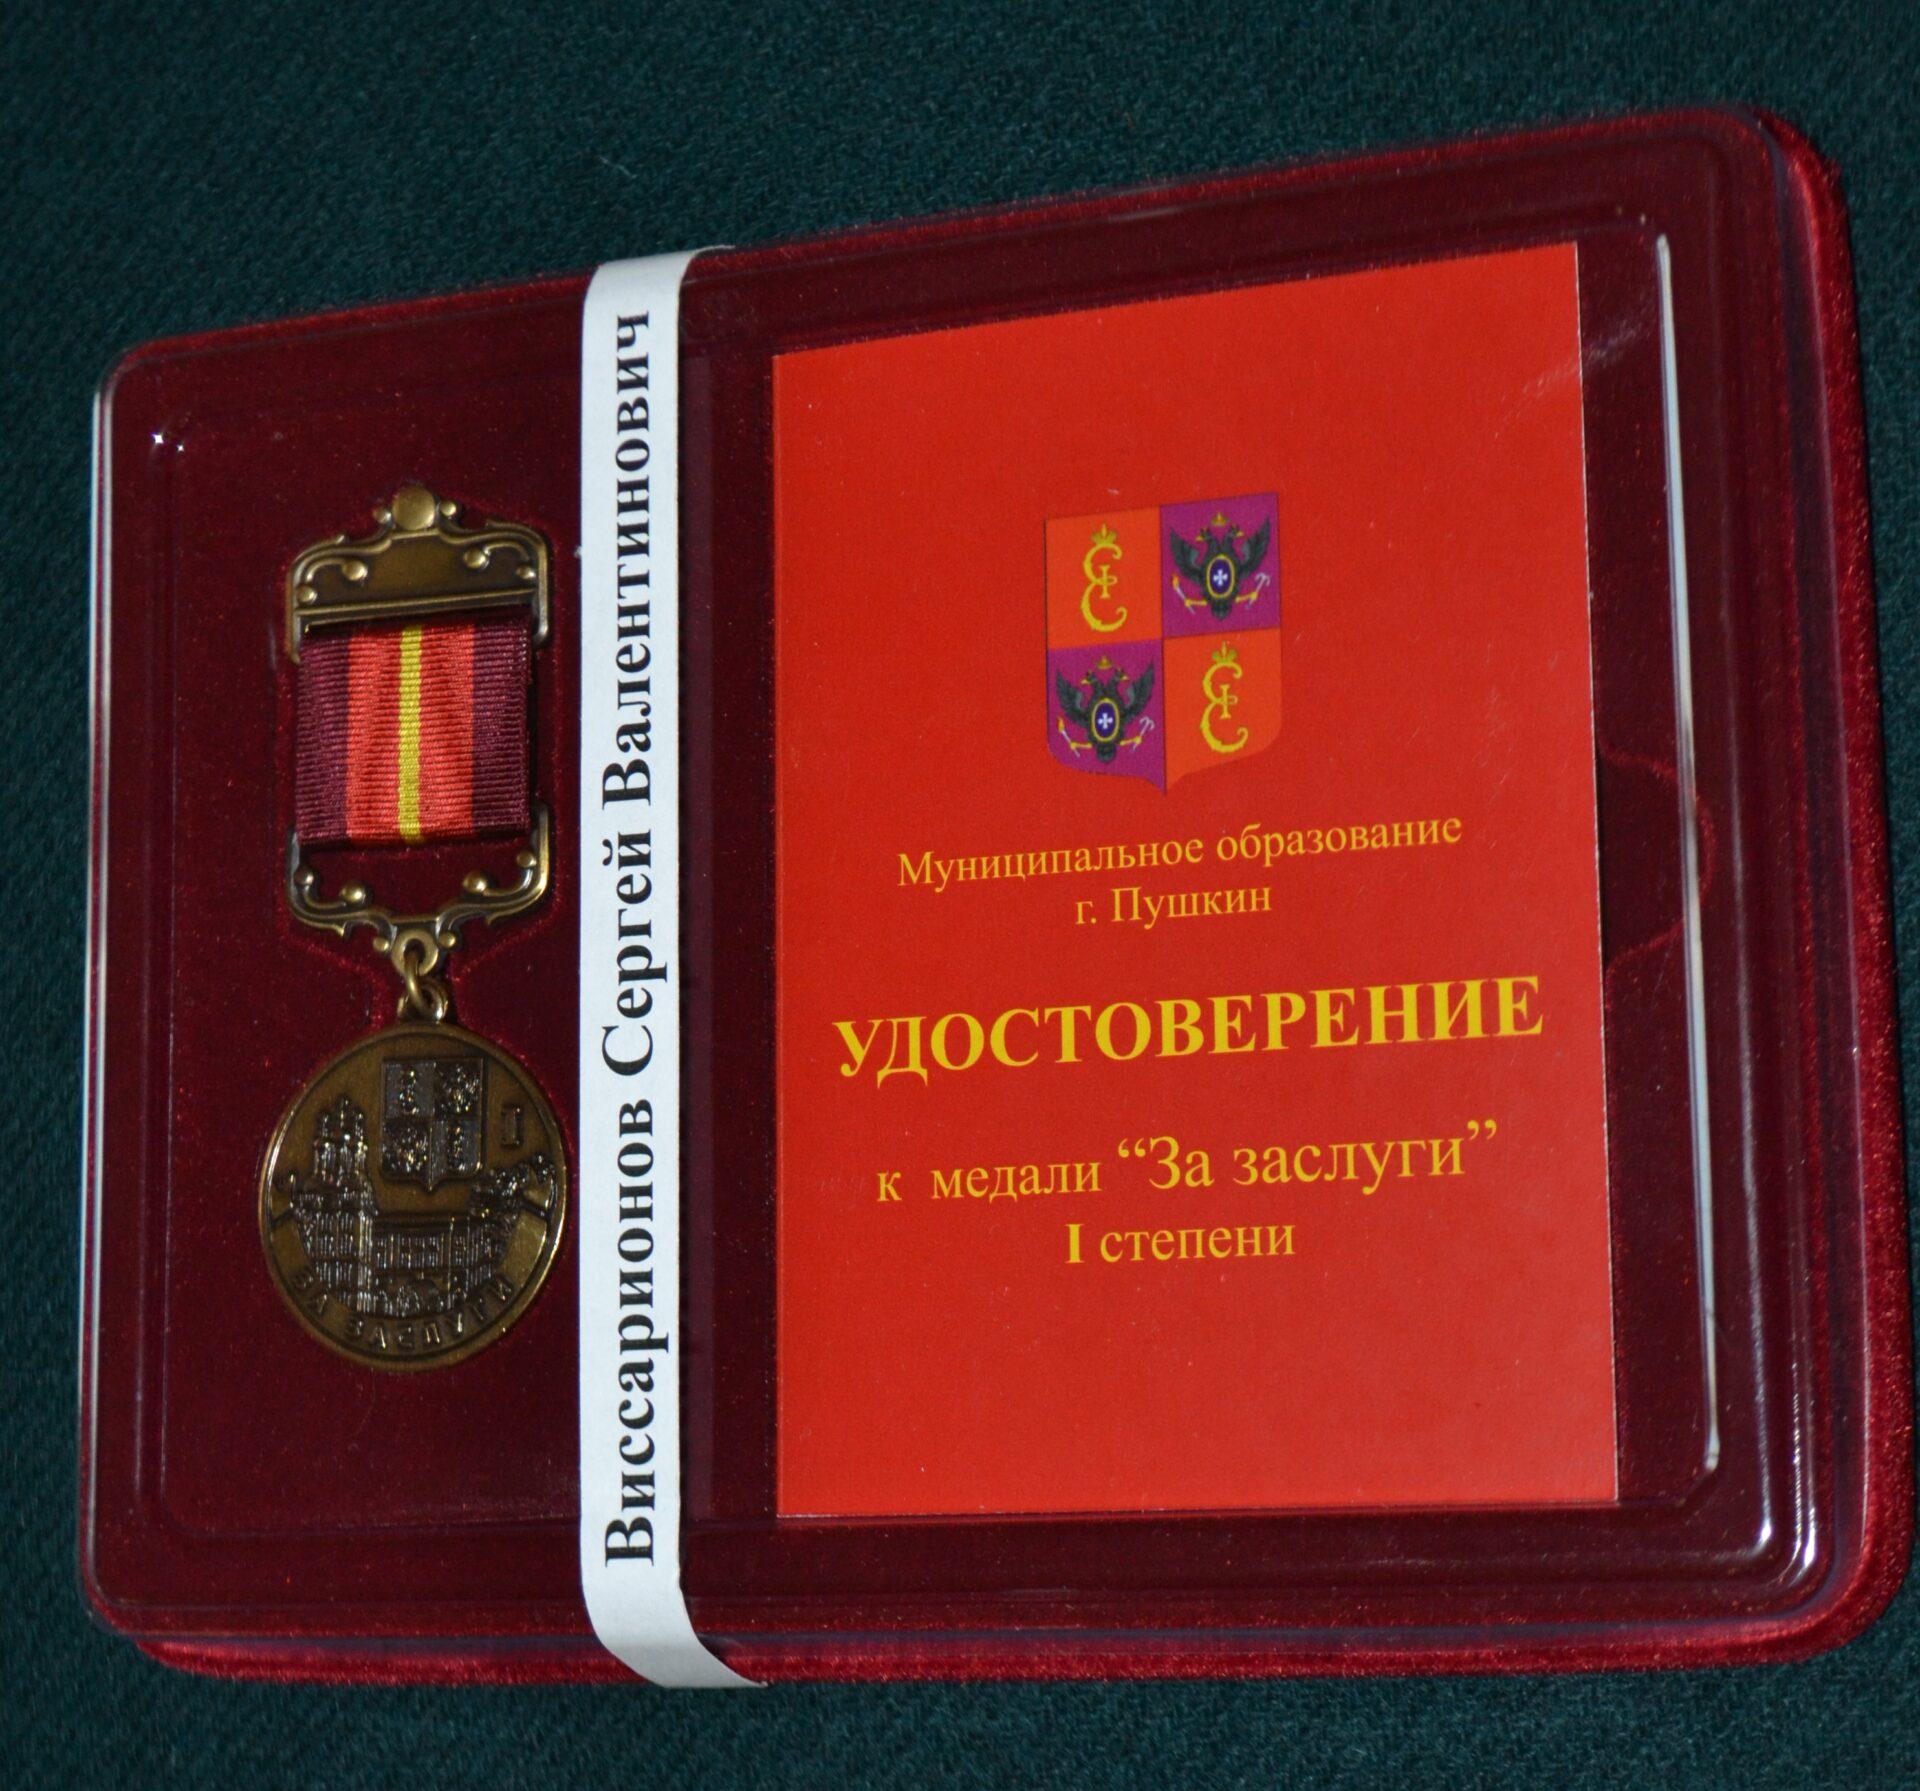 награда виссарионов за заслуги пушкин